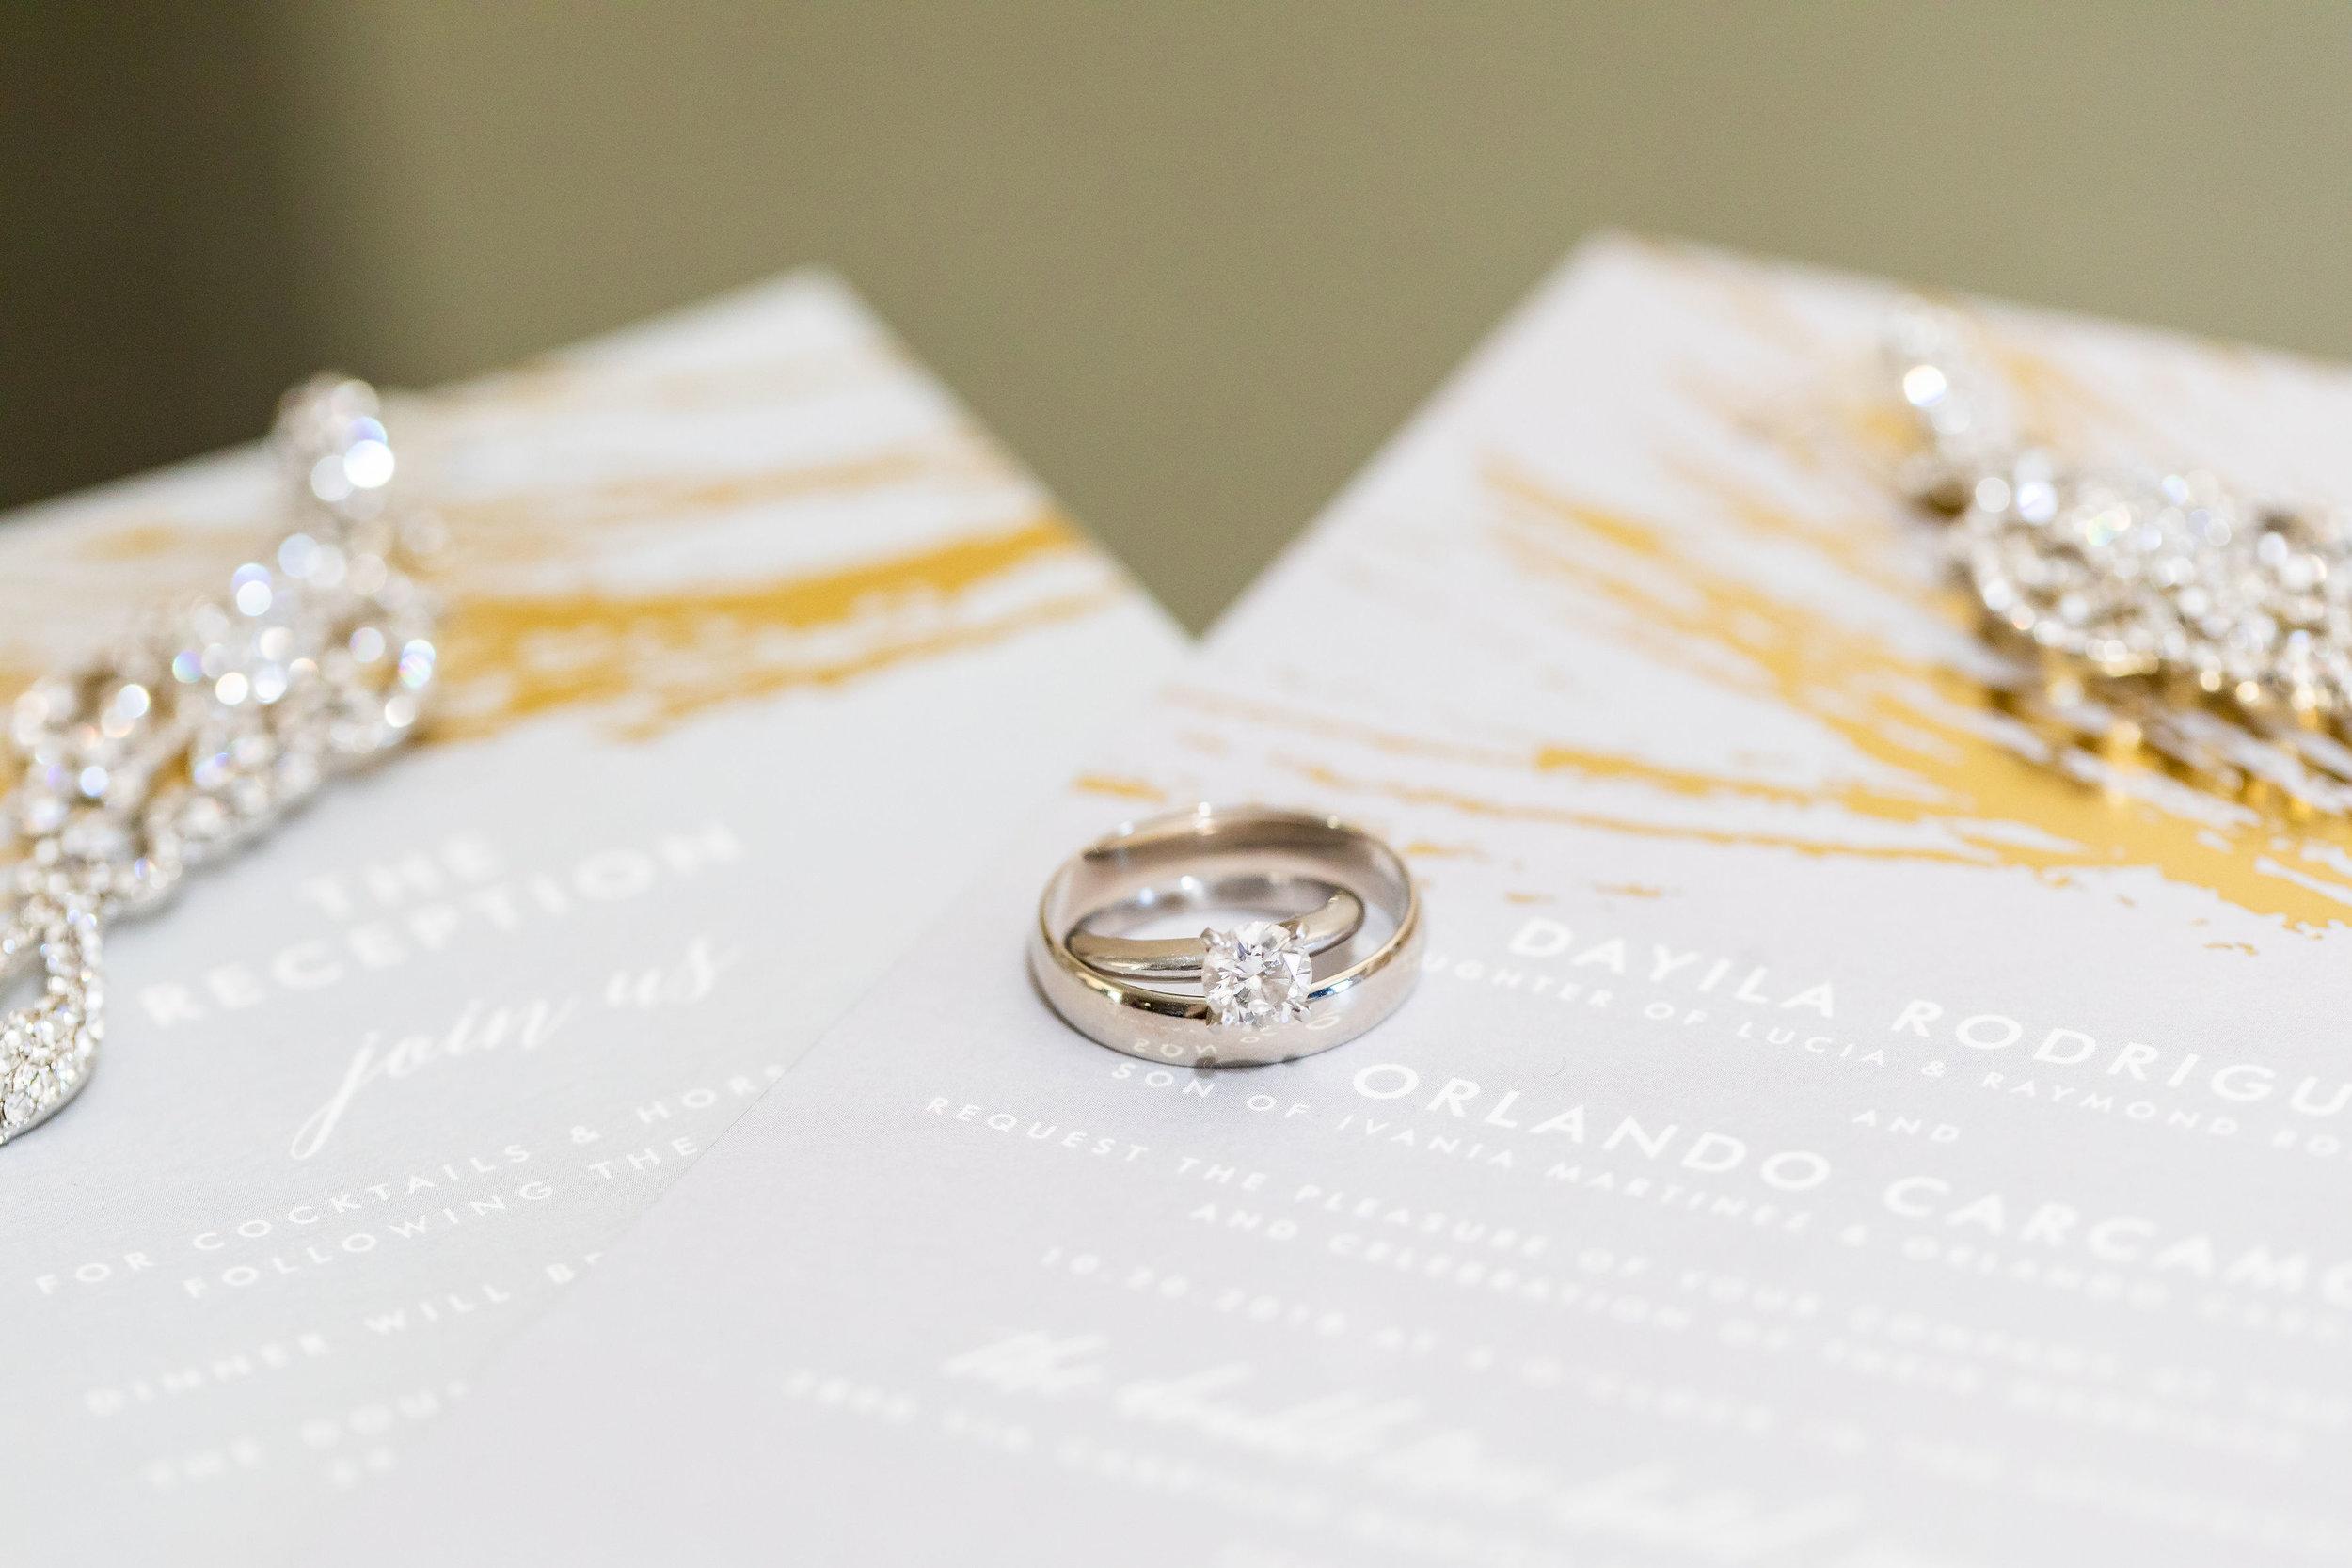 ! Wedding Rings on Invitation Detail Shots Getting Ready.jpg